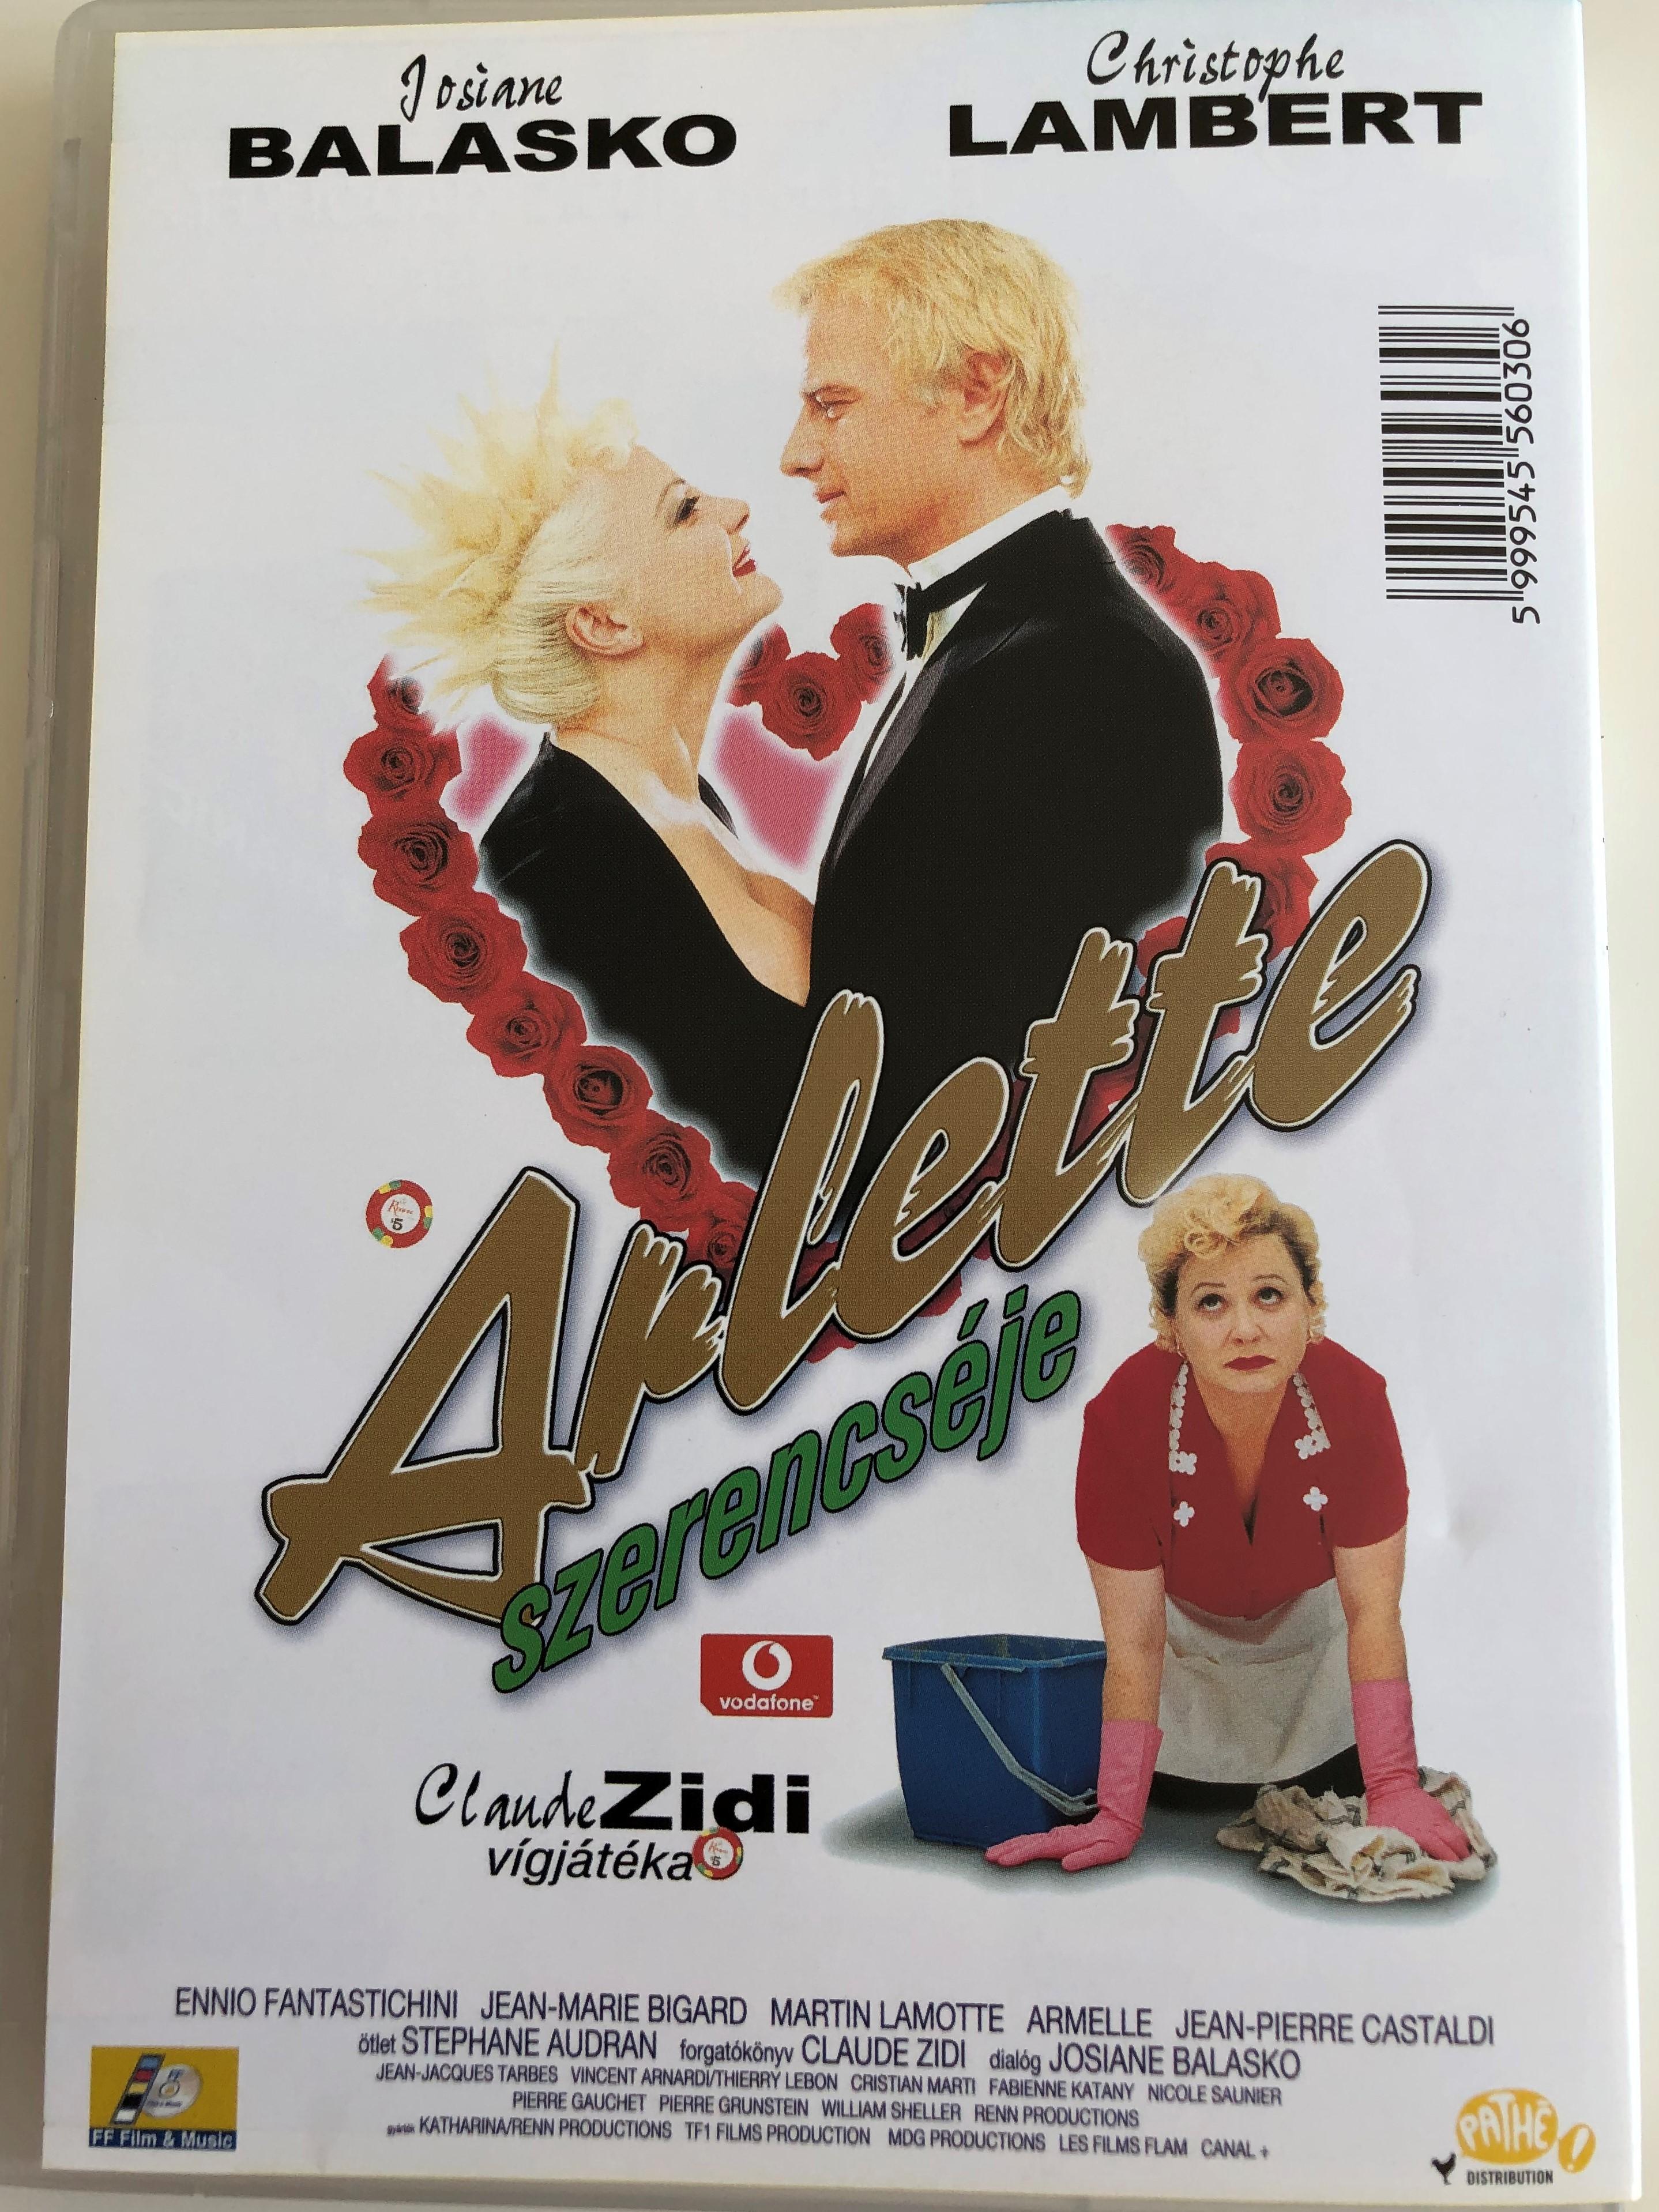 parole-de-flic-dvd-1985-a-zsaru-szava-directed-by-jose-pinheiro-starring-alain-delon-jacques-perrin-arlette-dvd-1997-arlette-szerencs-je-directed-by-claude-zidi-starring-christopher-lambert-josiane-balasko-3-.jpg